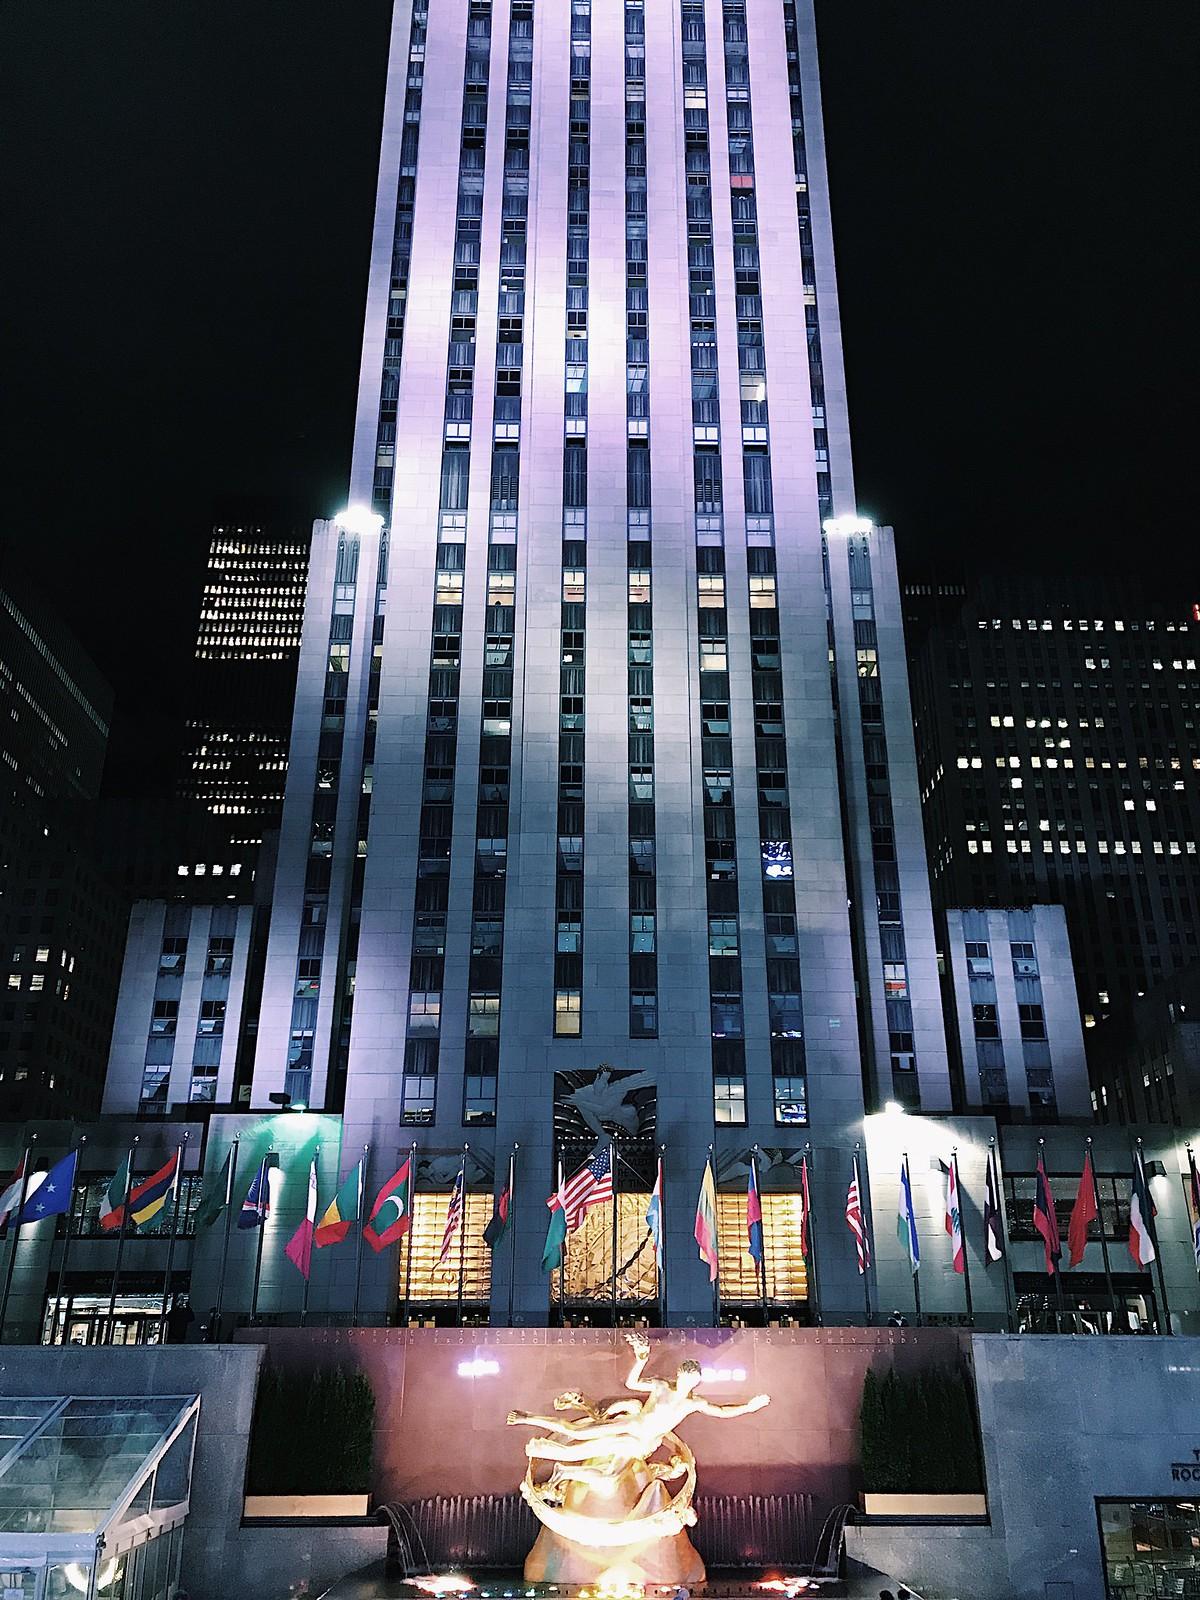 rockefeller-rockefellercenter-fifthavenue-manhattan-nyc-newyork-nyfw-newyorkfashionweek-newyorkcity-clothestoyouuu-elizabeeetht